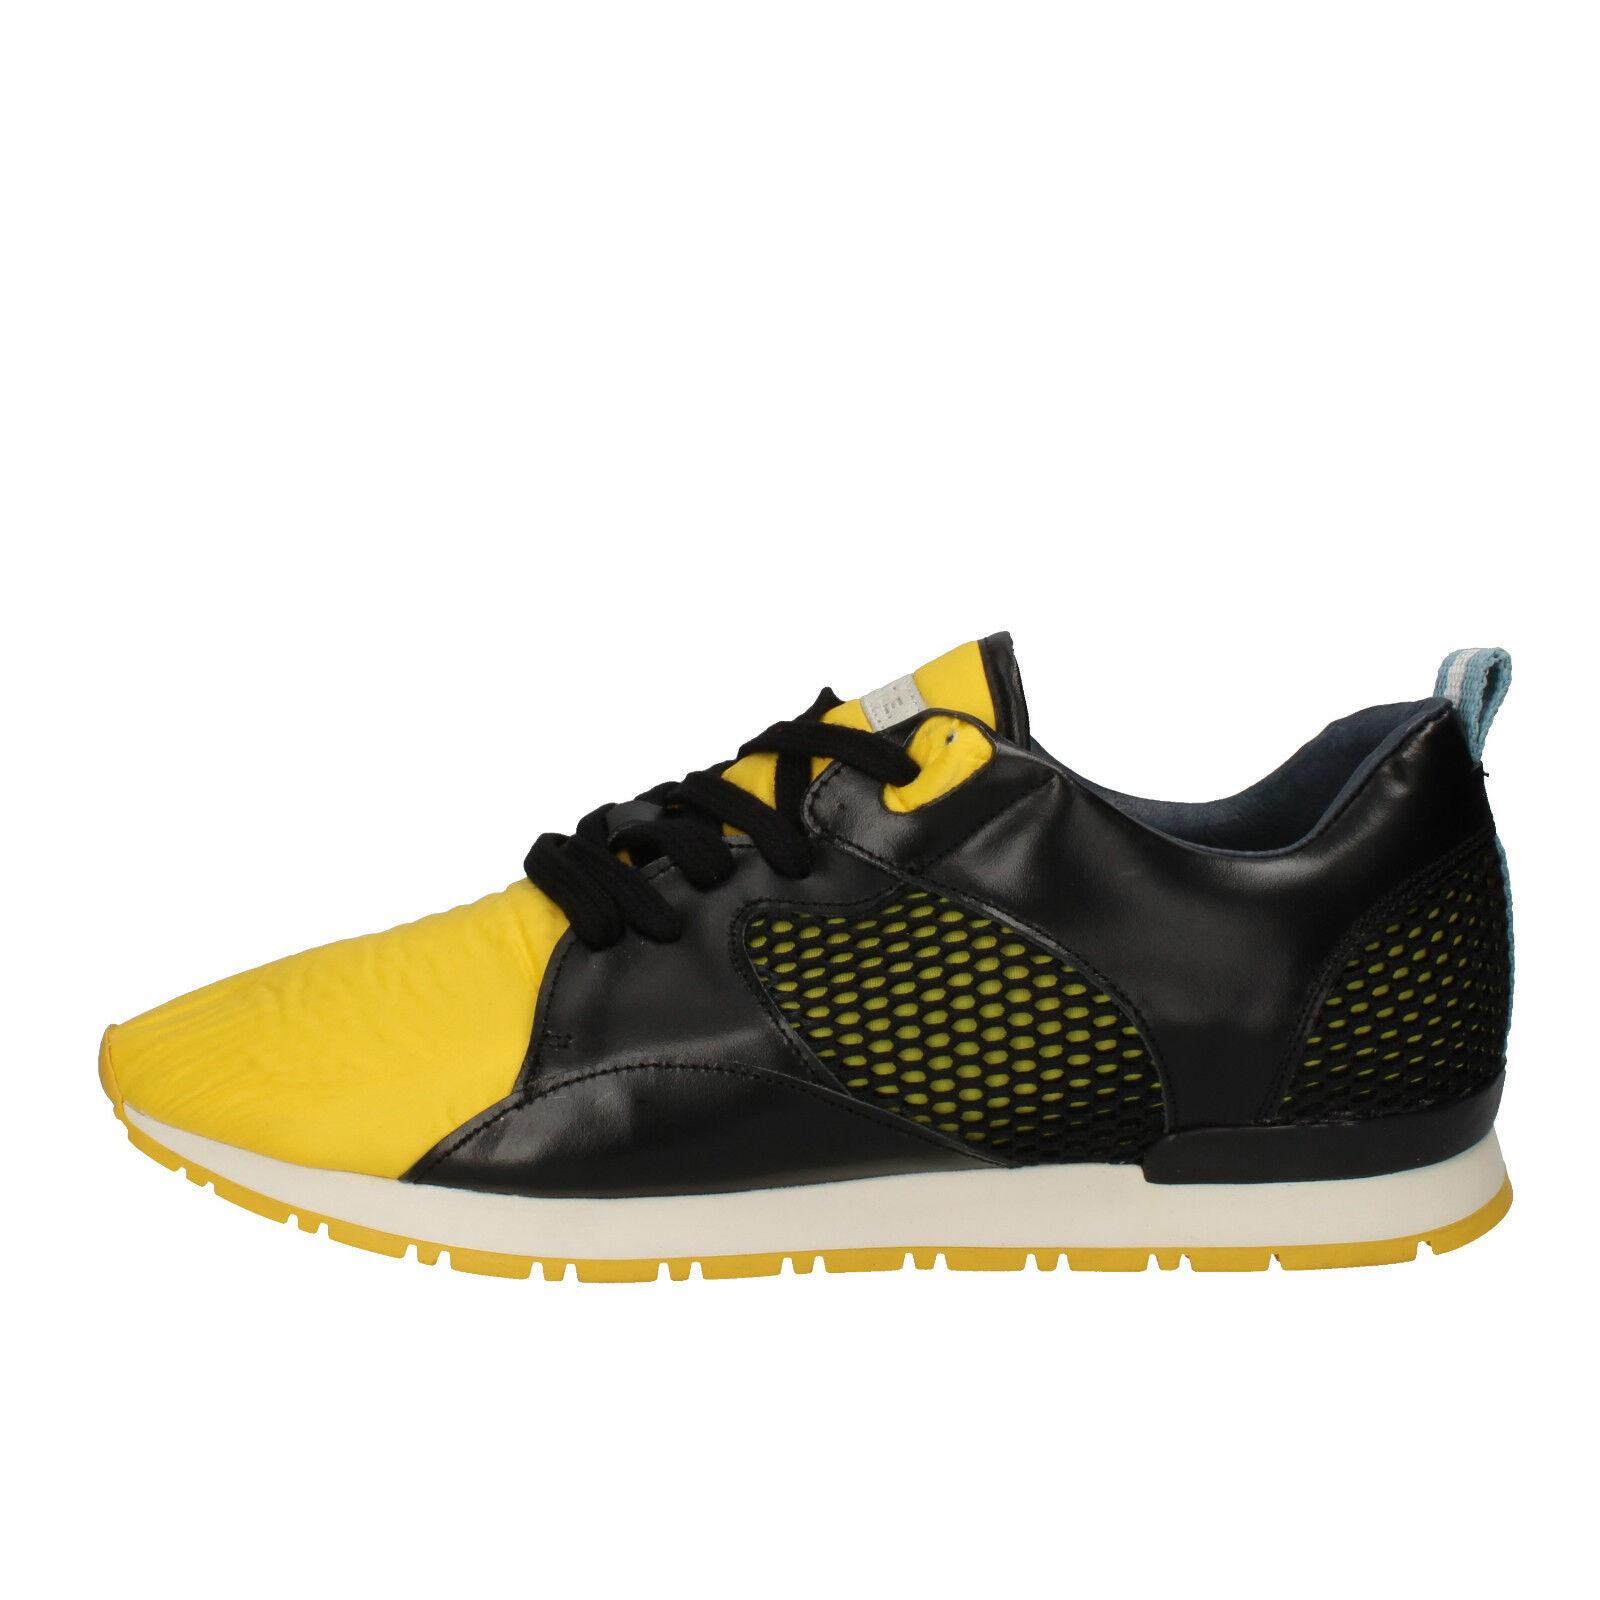 herren schuhe D.A.T.E. (date) 42 EU sneakers schwarz gelb leder textil AE533-B